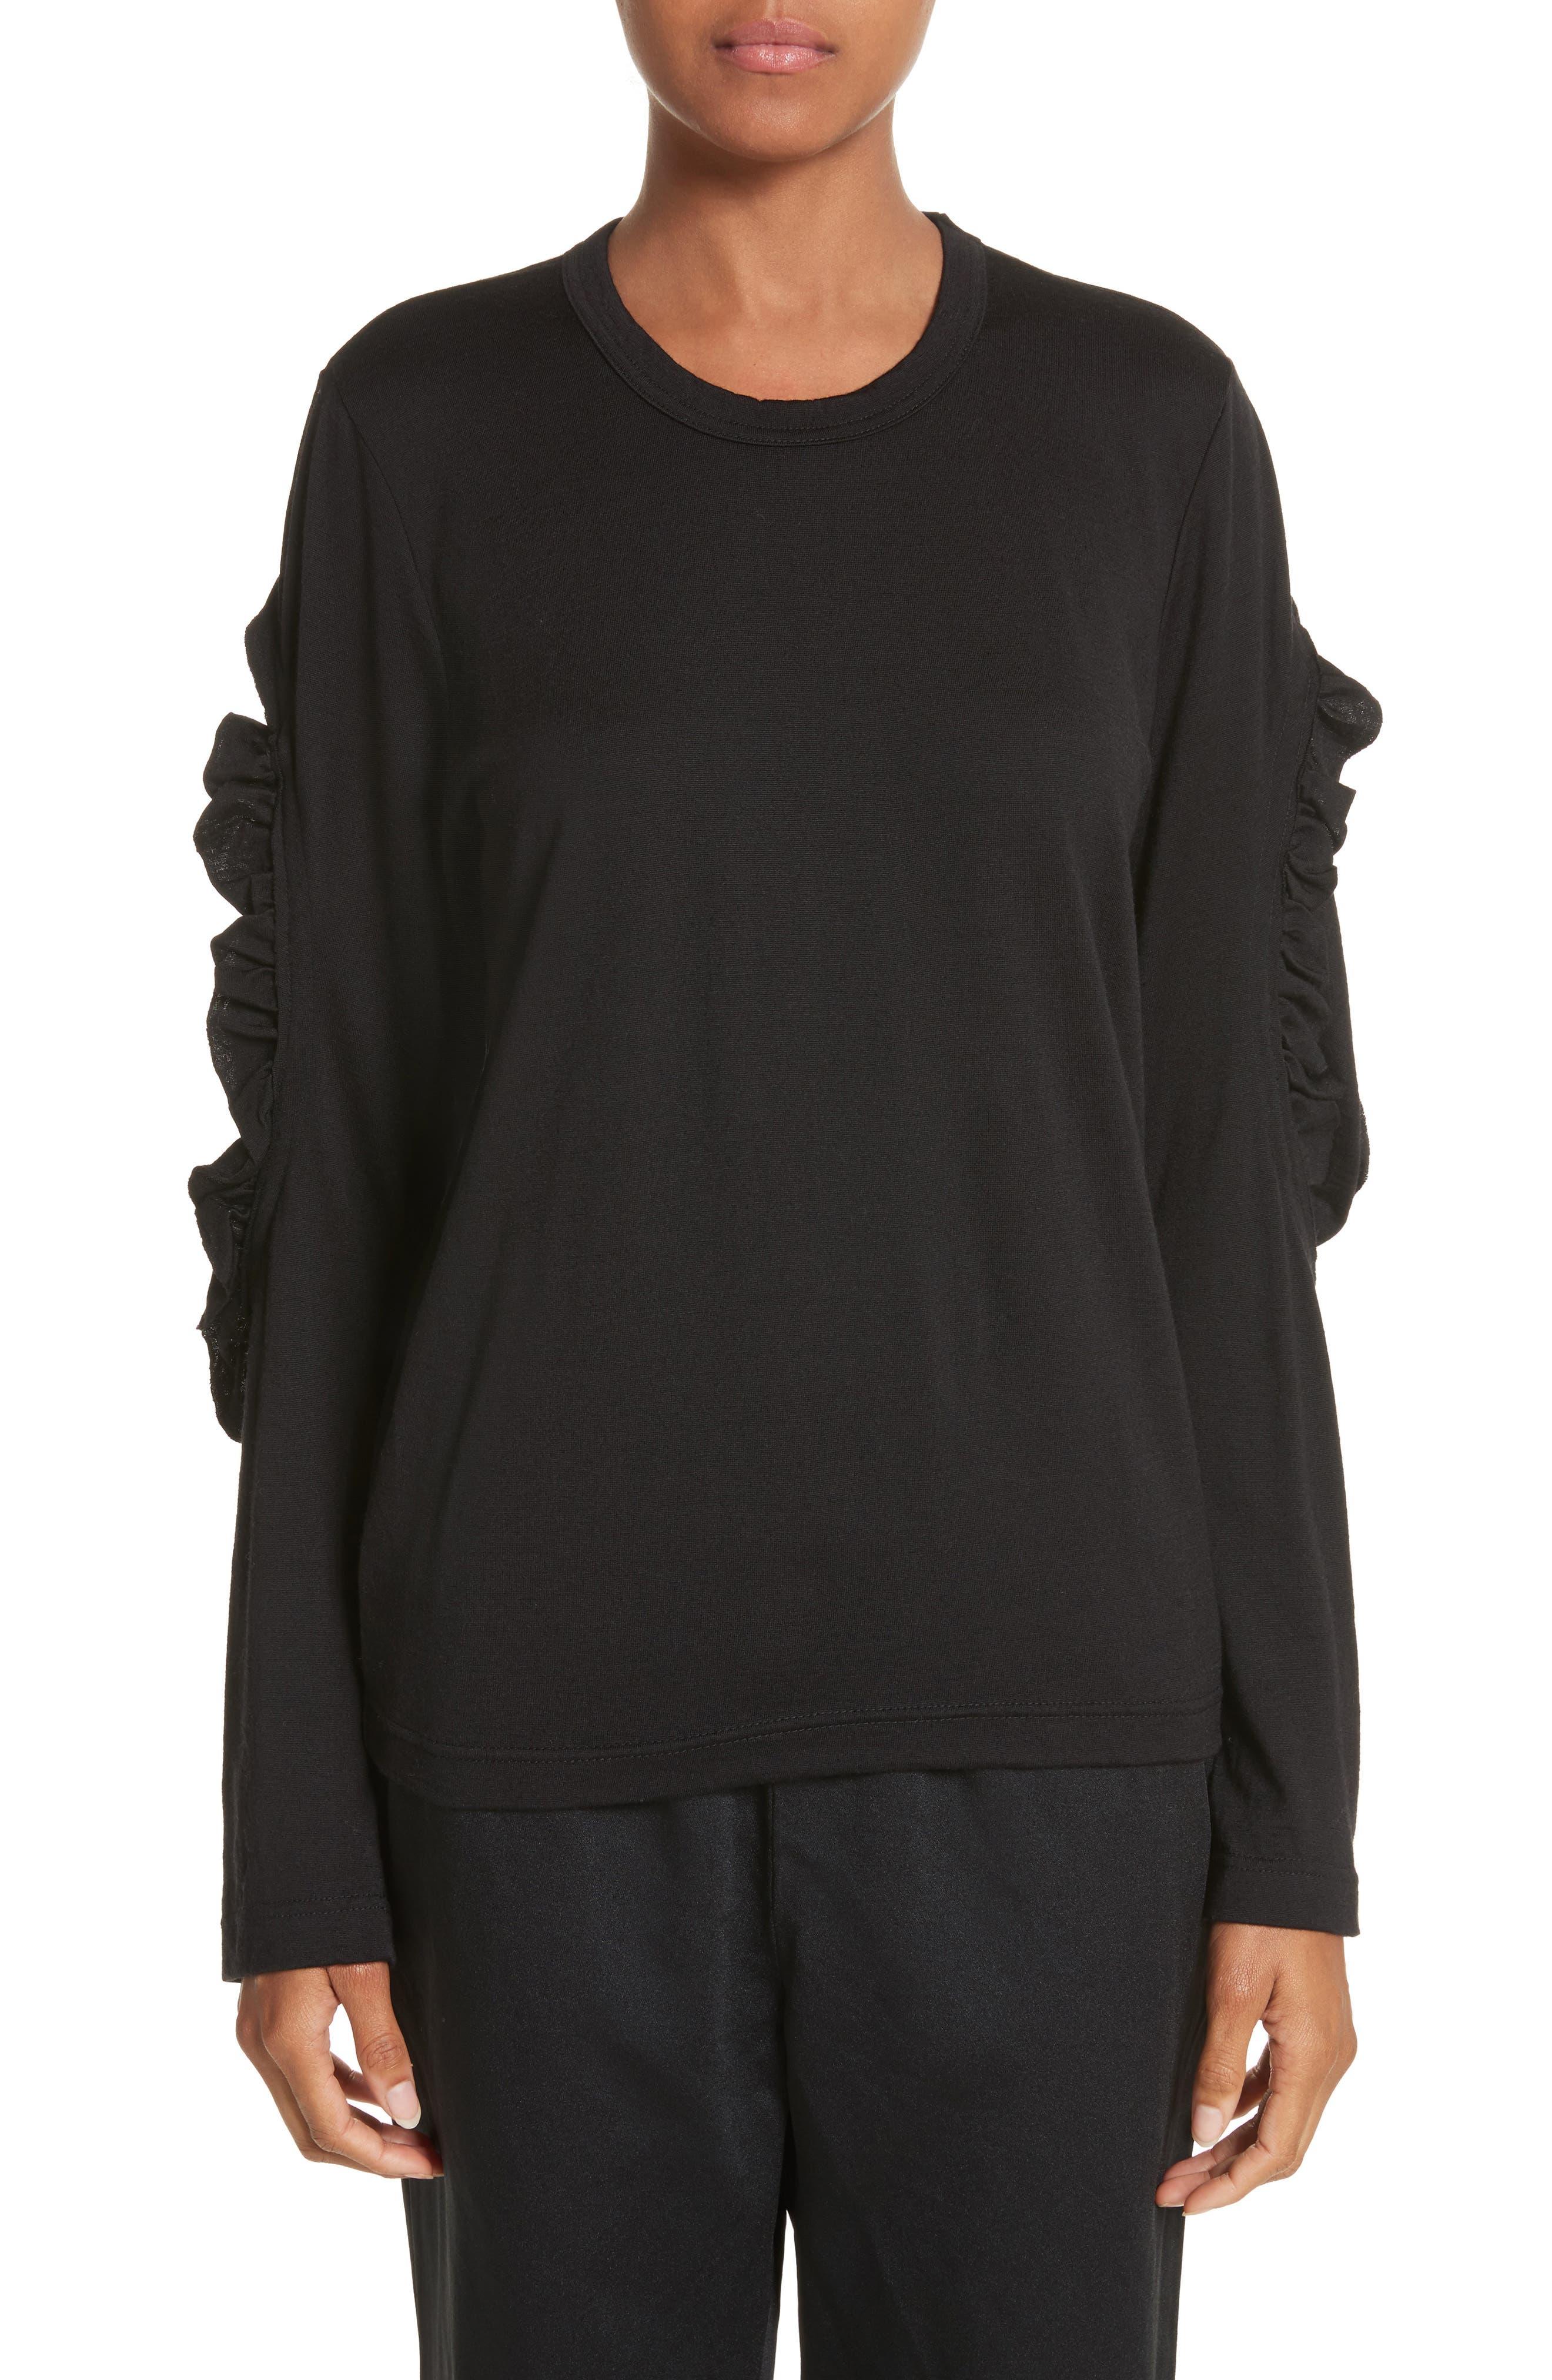 Alternate Image 1 Selected - Comme des Garçons Ruffle Sleeve Wool Top